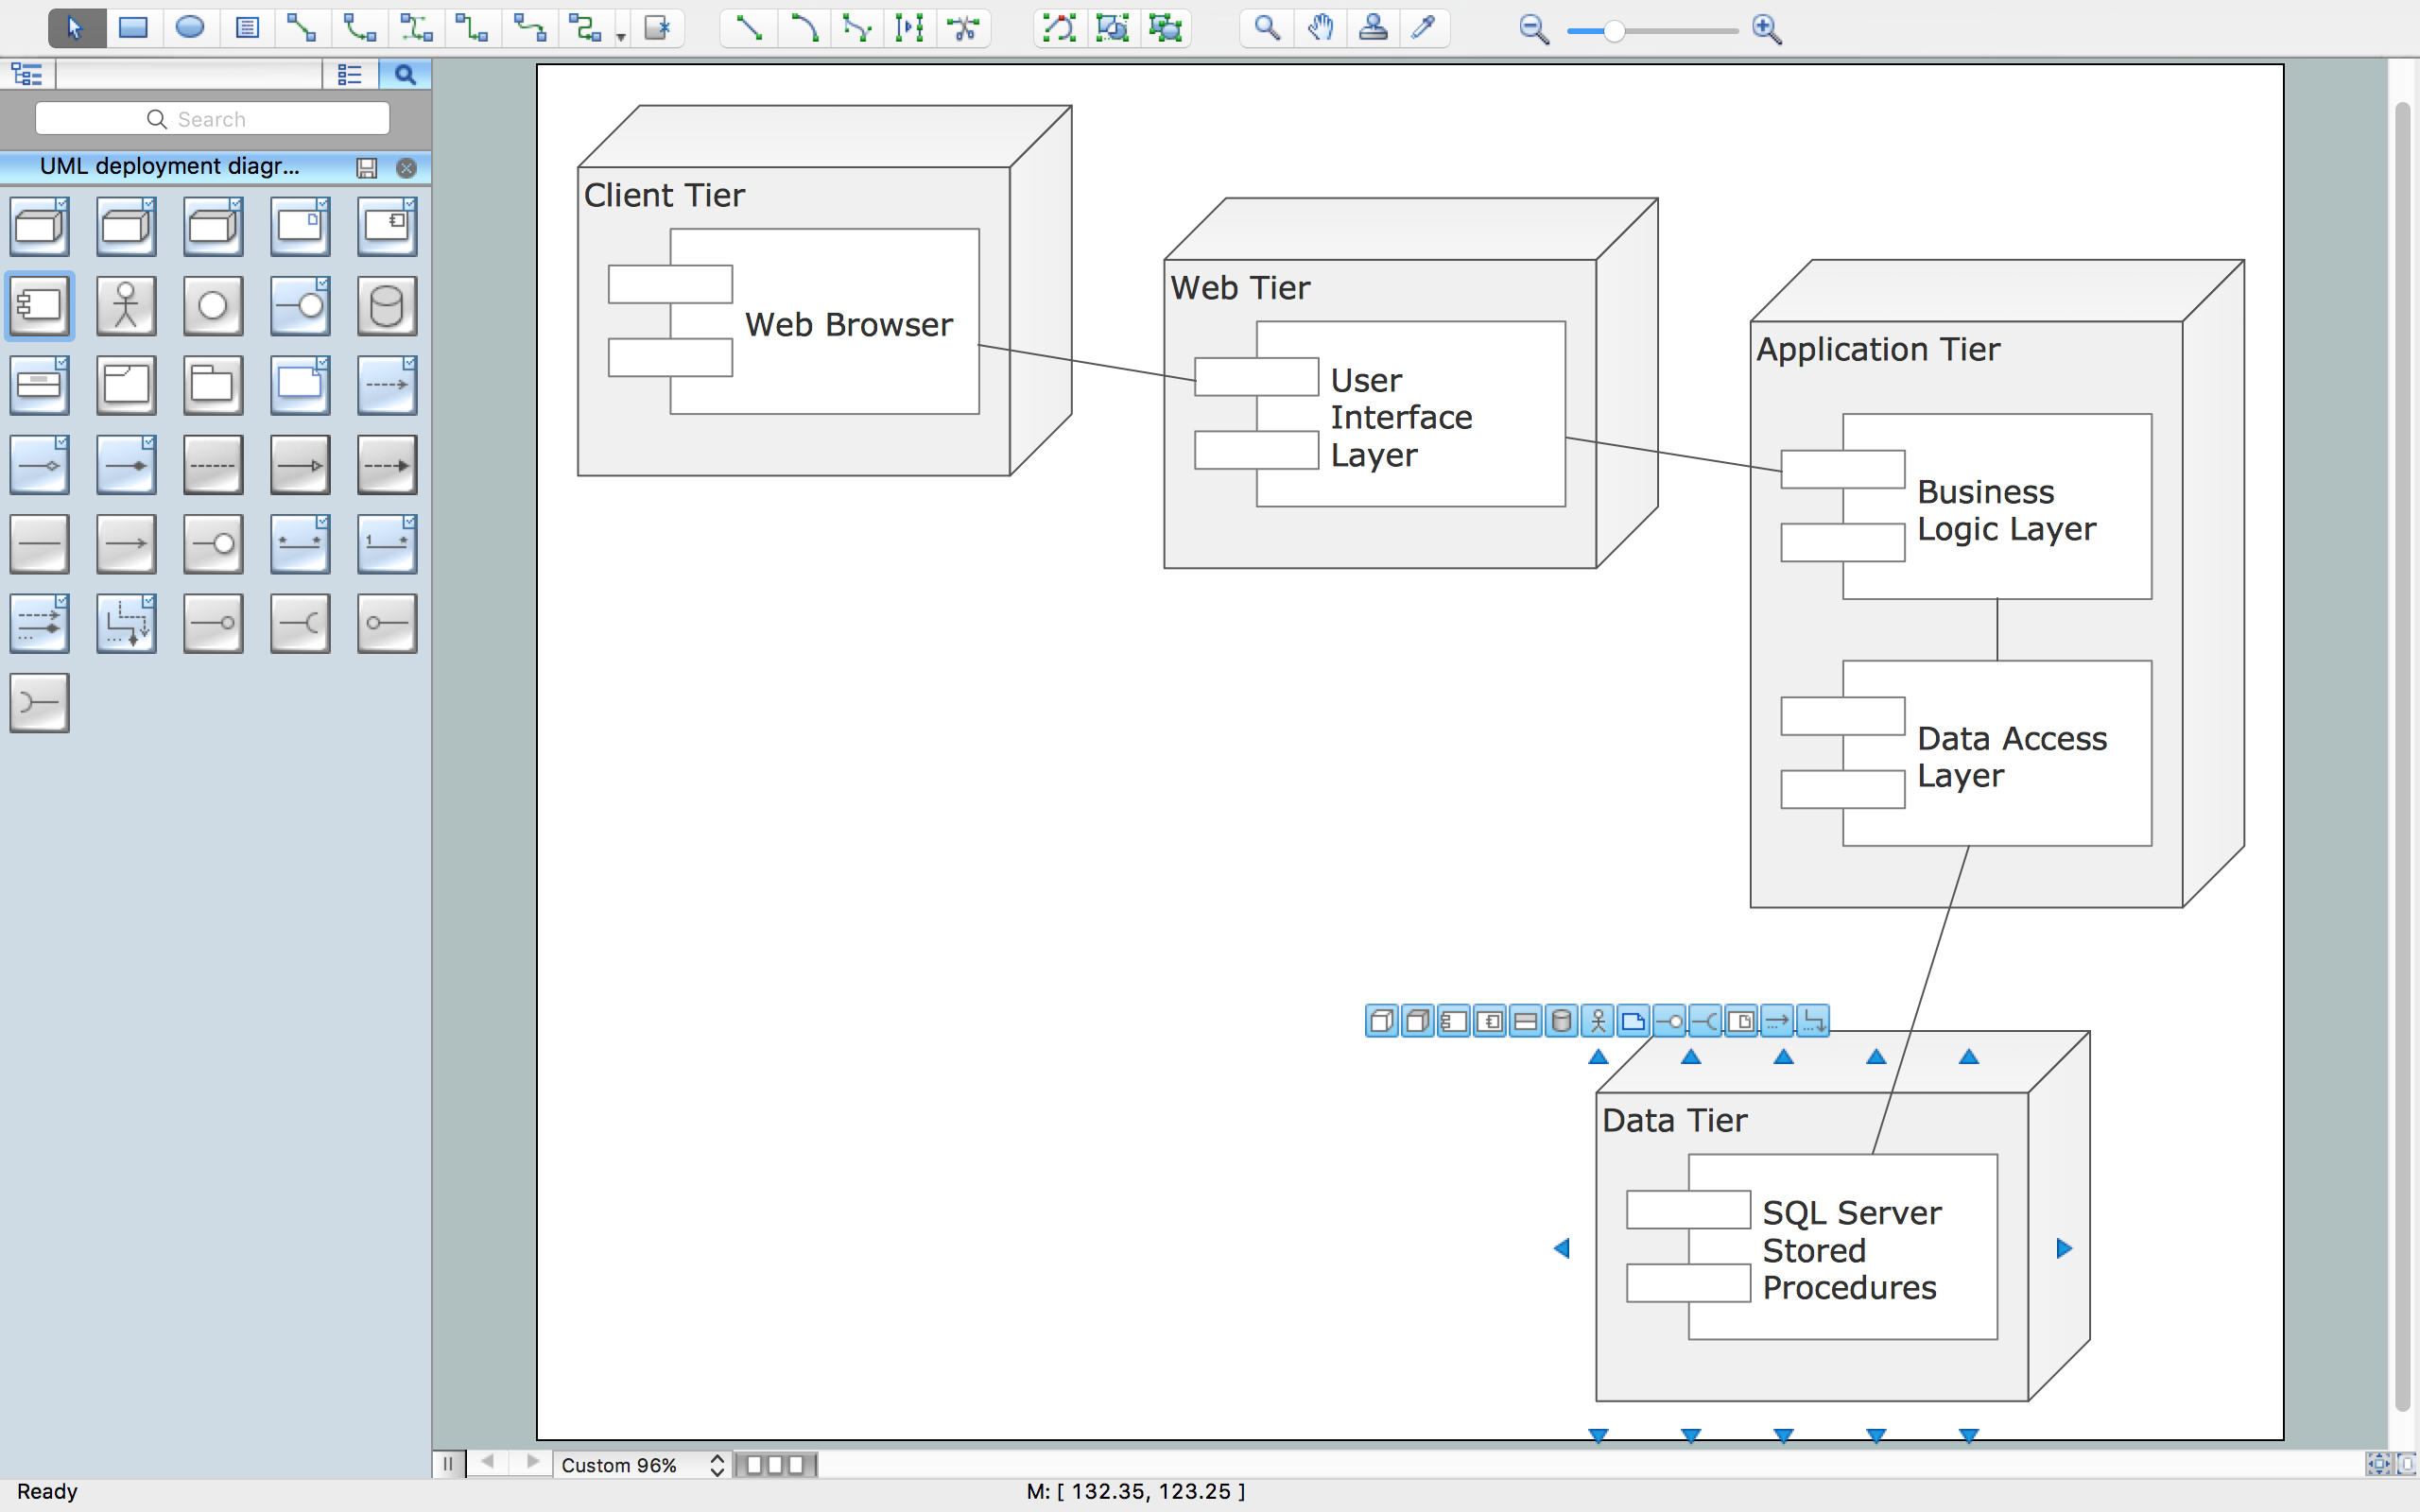 Create A Uml Deployment Diagram Manual Guide